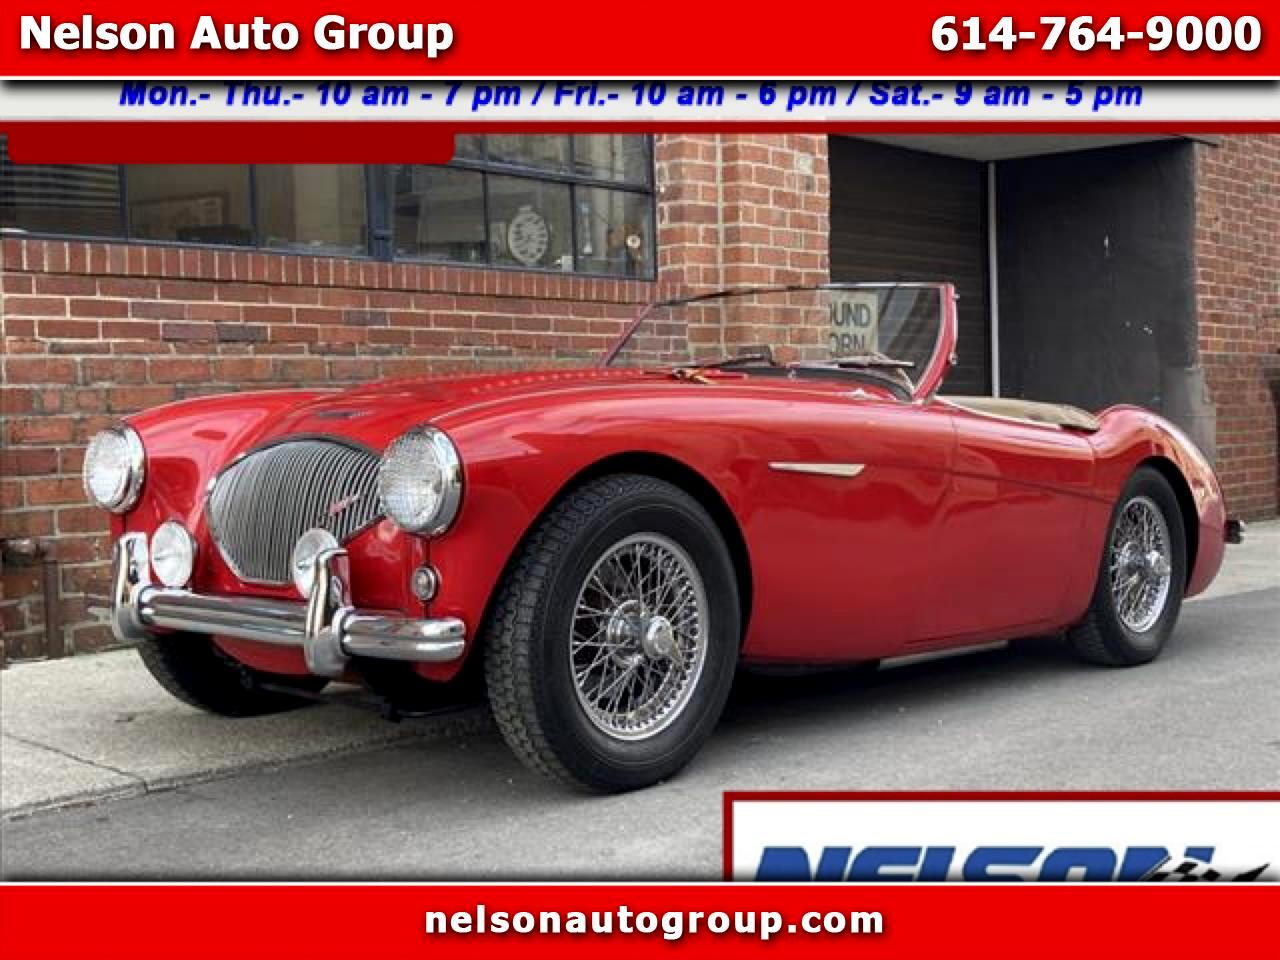 Austin-Healey 100-4 BN1  1956